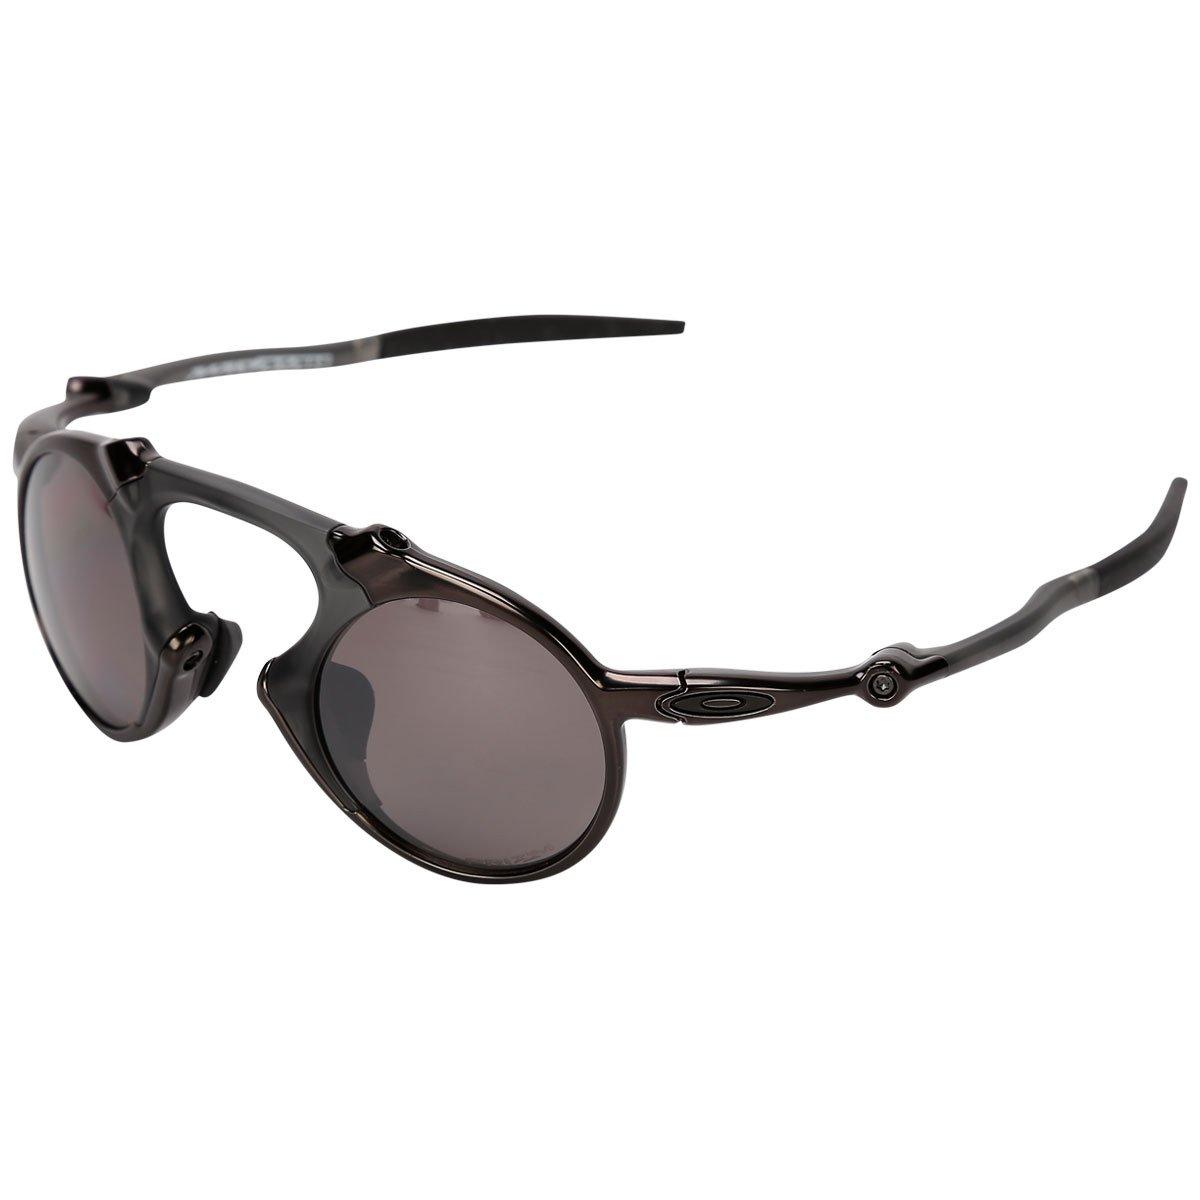 Óculos Oakley Madman - Prizm Daily - Compre Agora   Zattini 5ac69b2ade